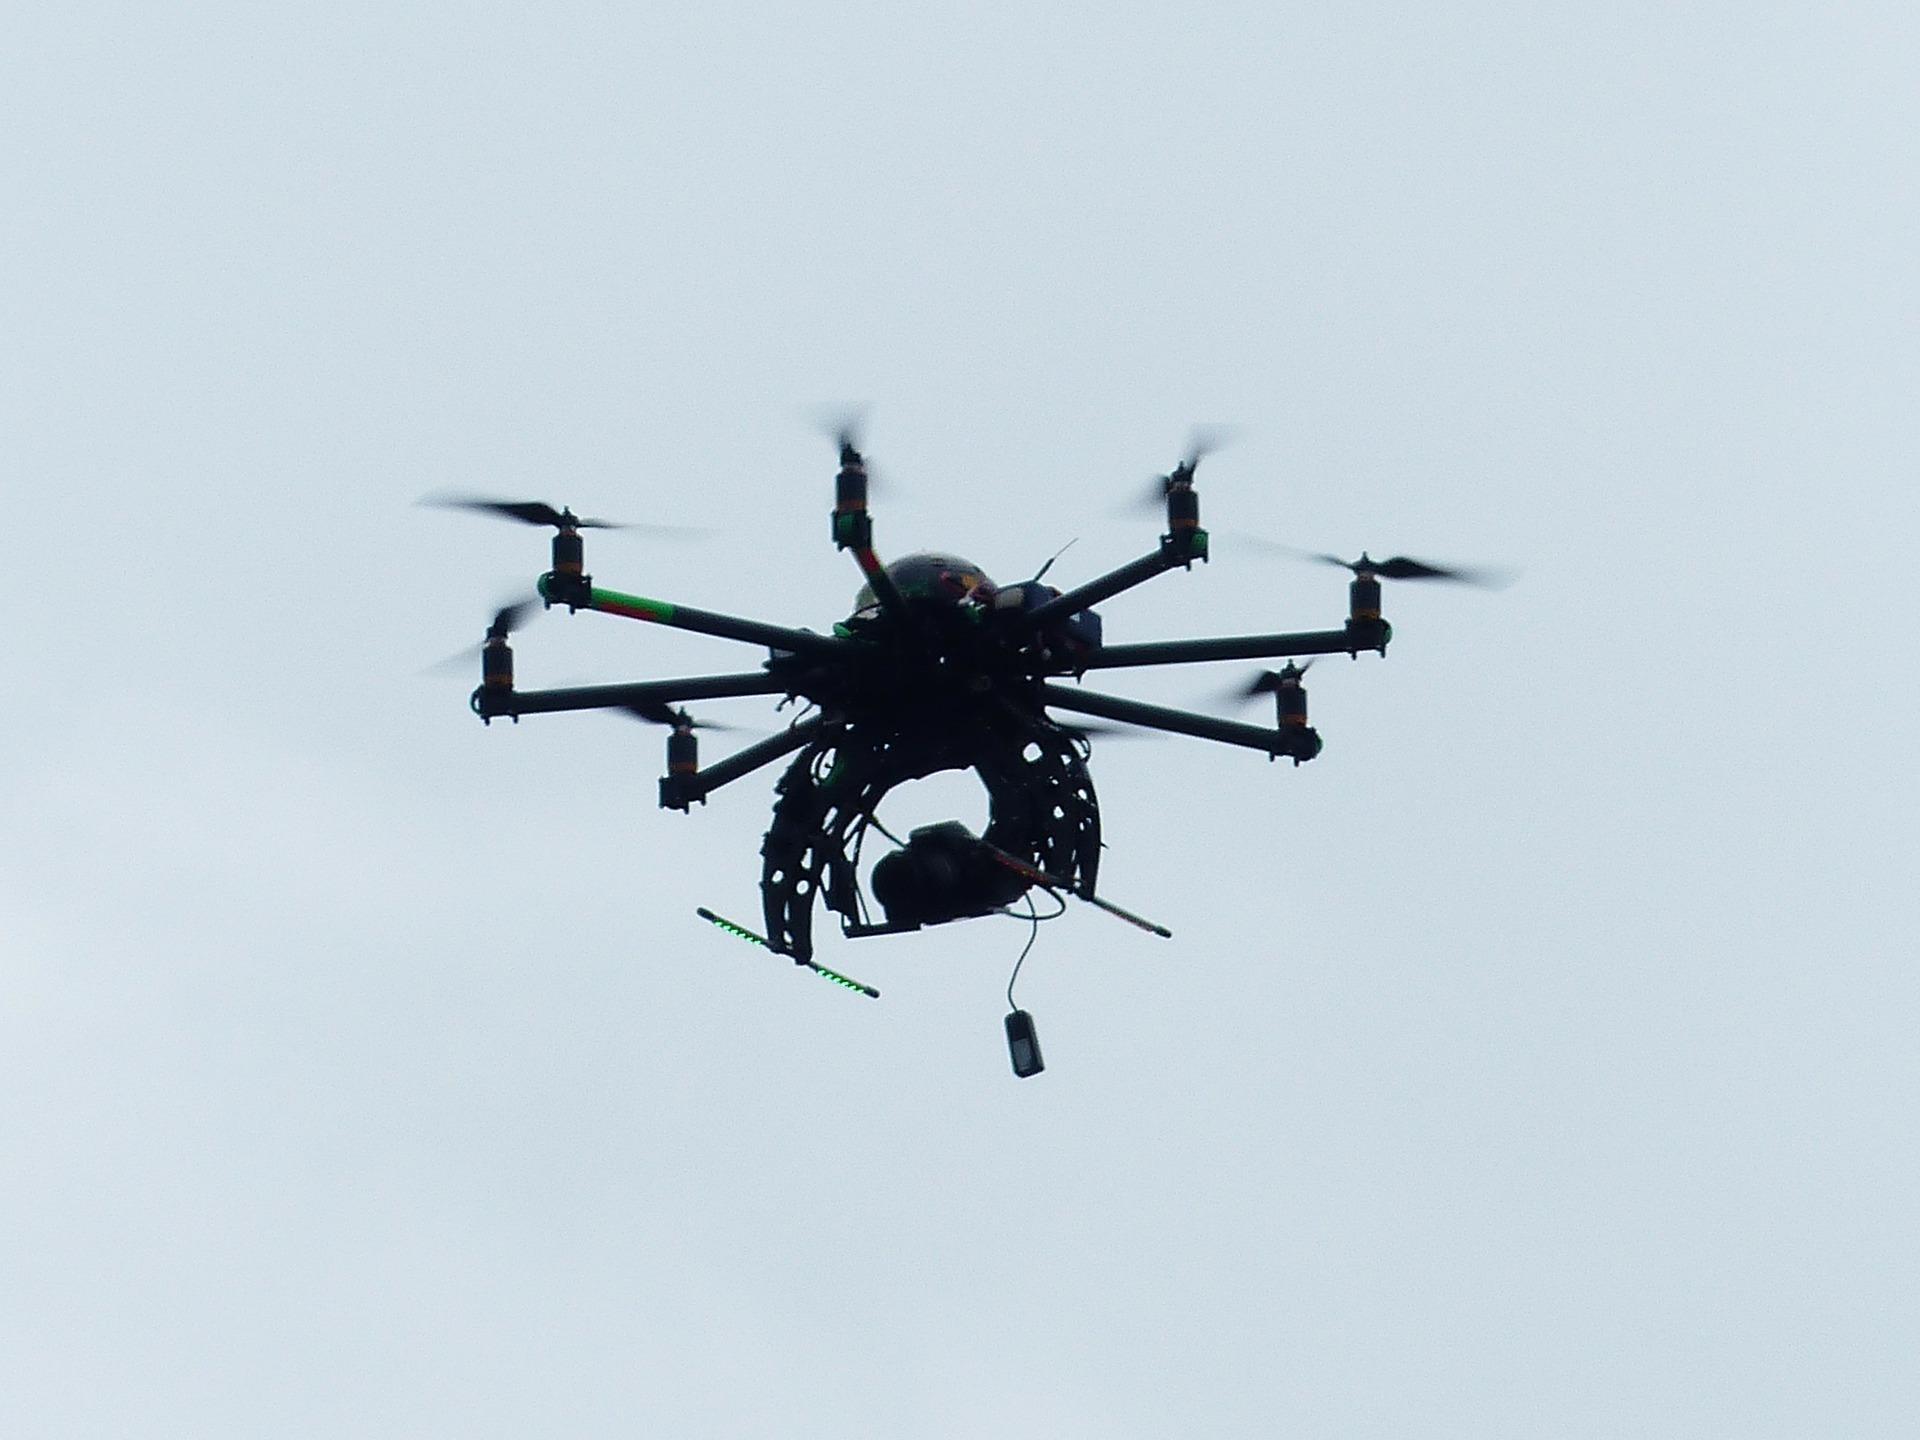 Texas Utility Starts Drone Pilot Program